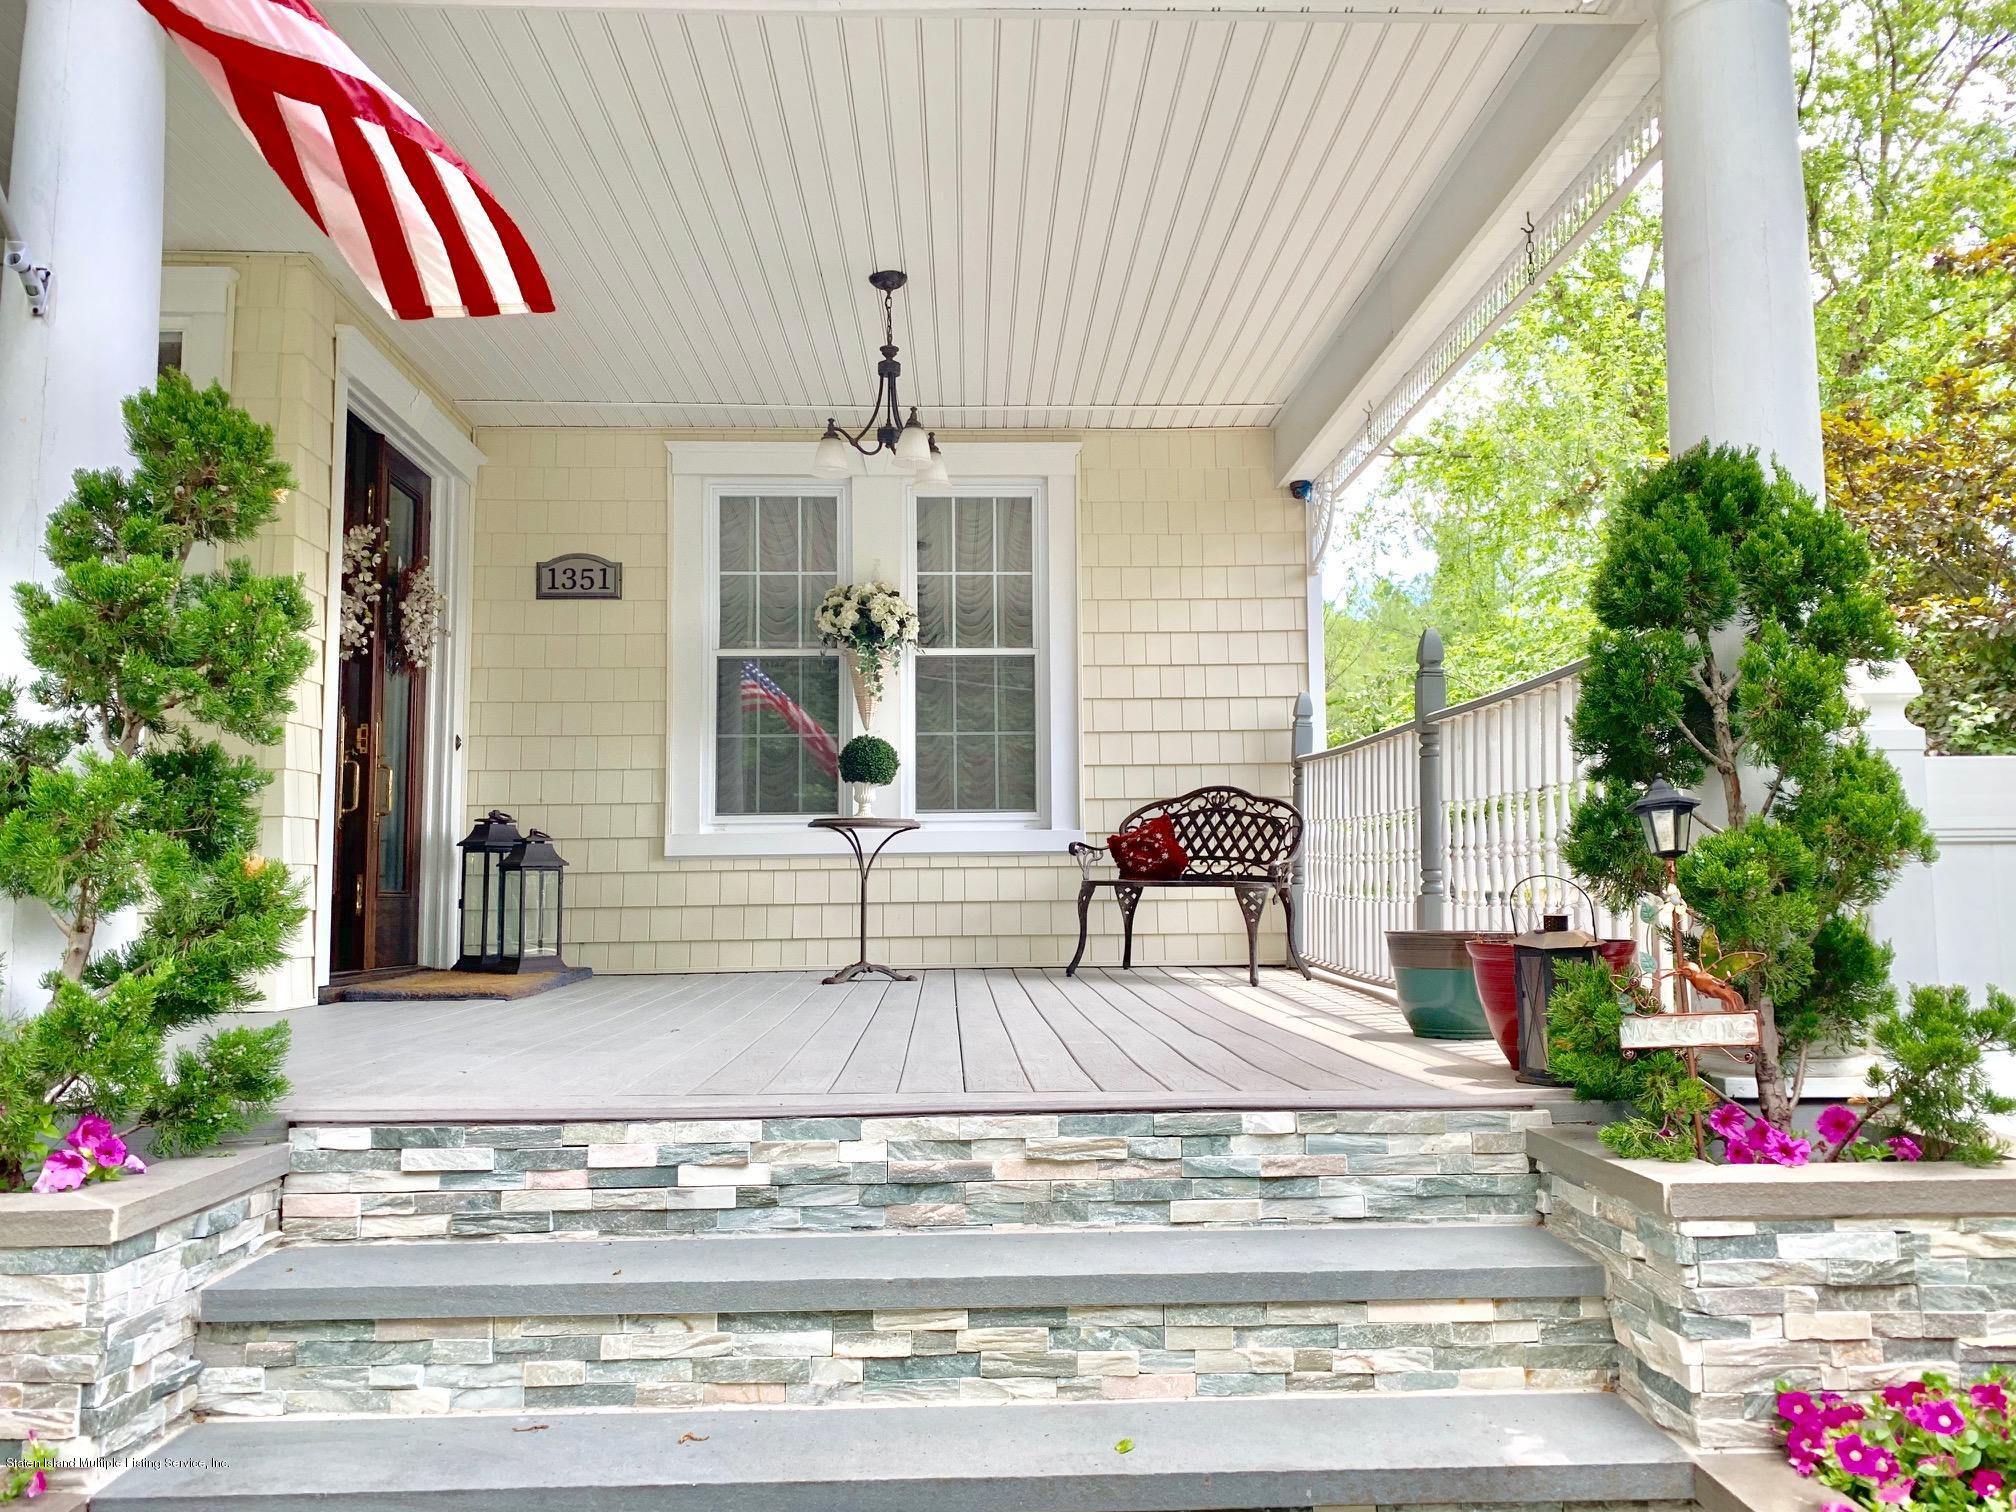 Single Family - Detached 1351 Huguenot Avenue  Staten Island, NY 10312, MLS-1133765-2